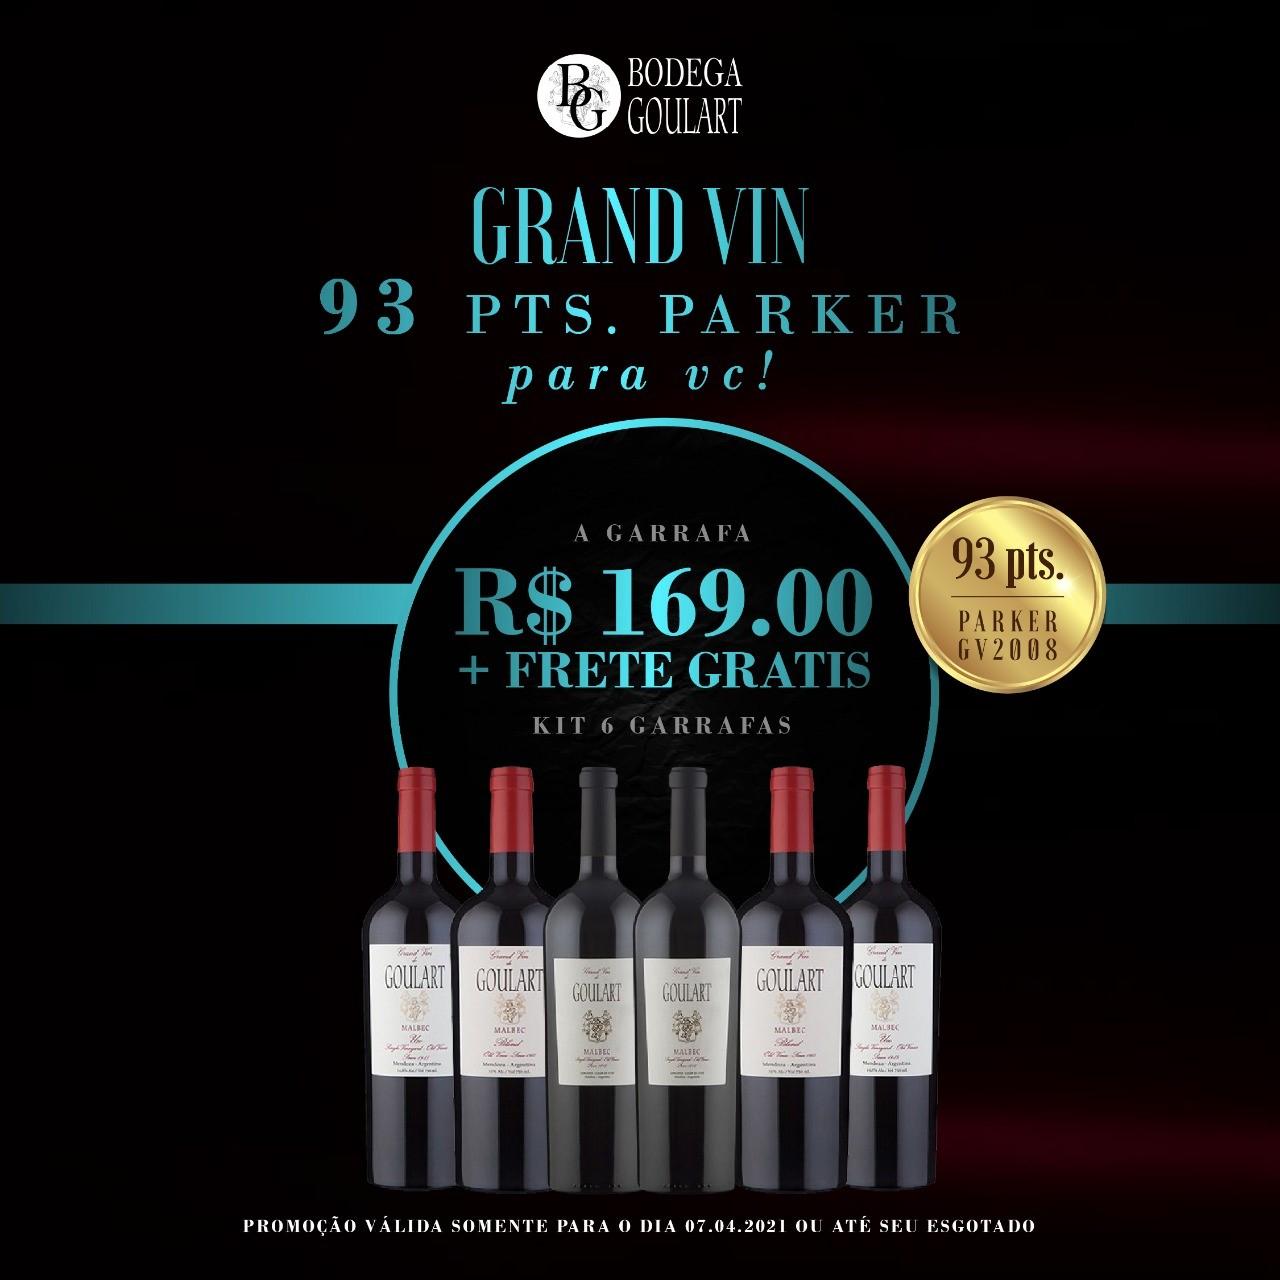 Kit 6 Garrafas - Especial Grand Vin